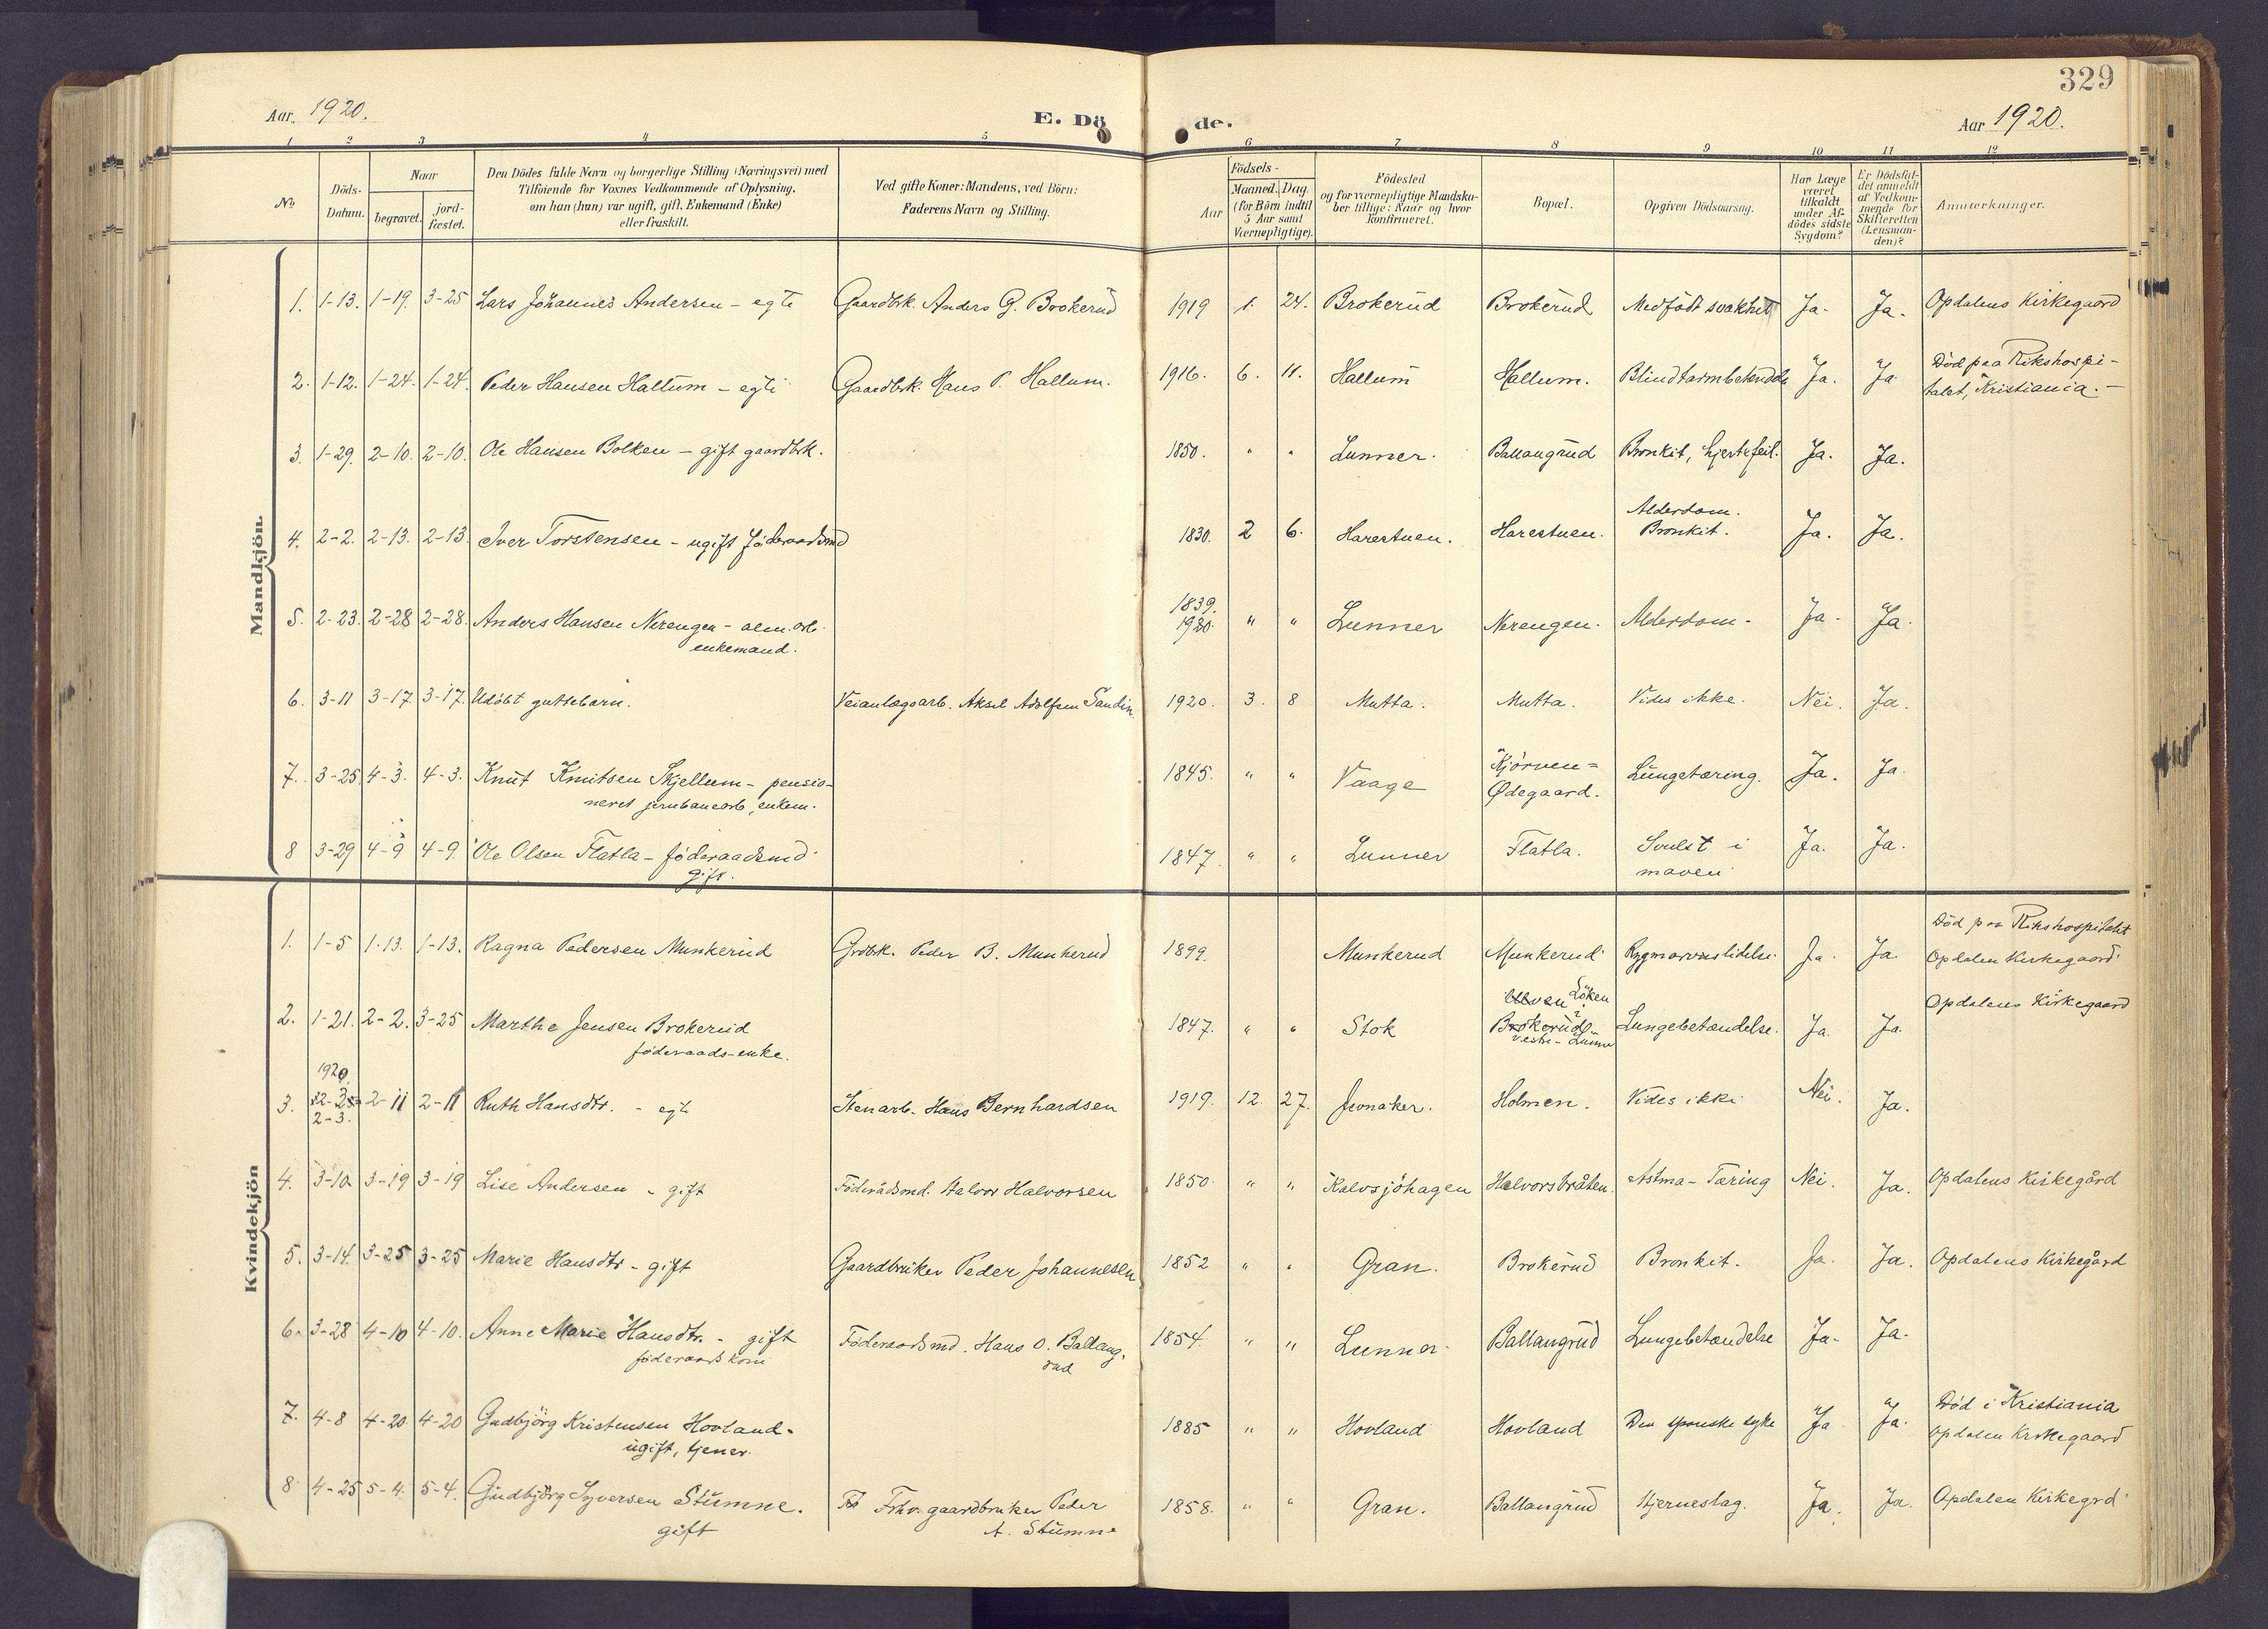 SAH, Lunner prestekontor, H/Ha/Haa/L0001: Ministerialbok nr. 1, 1907-1922, s. 329